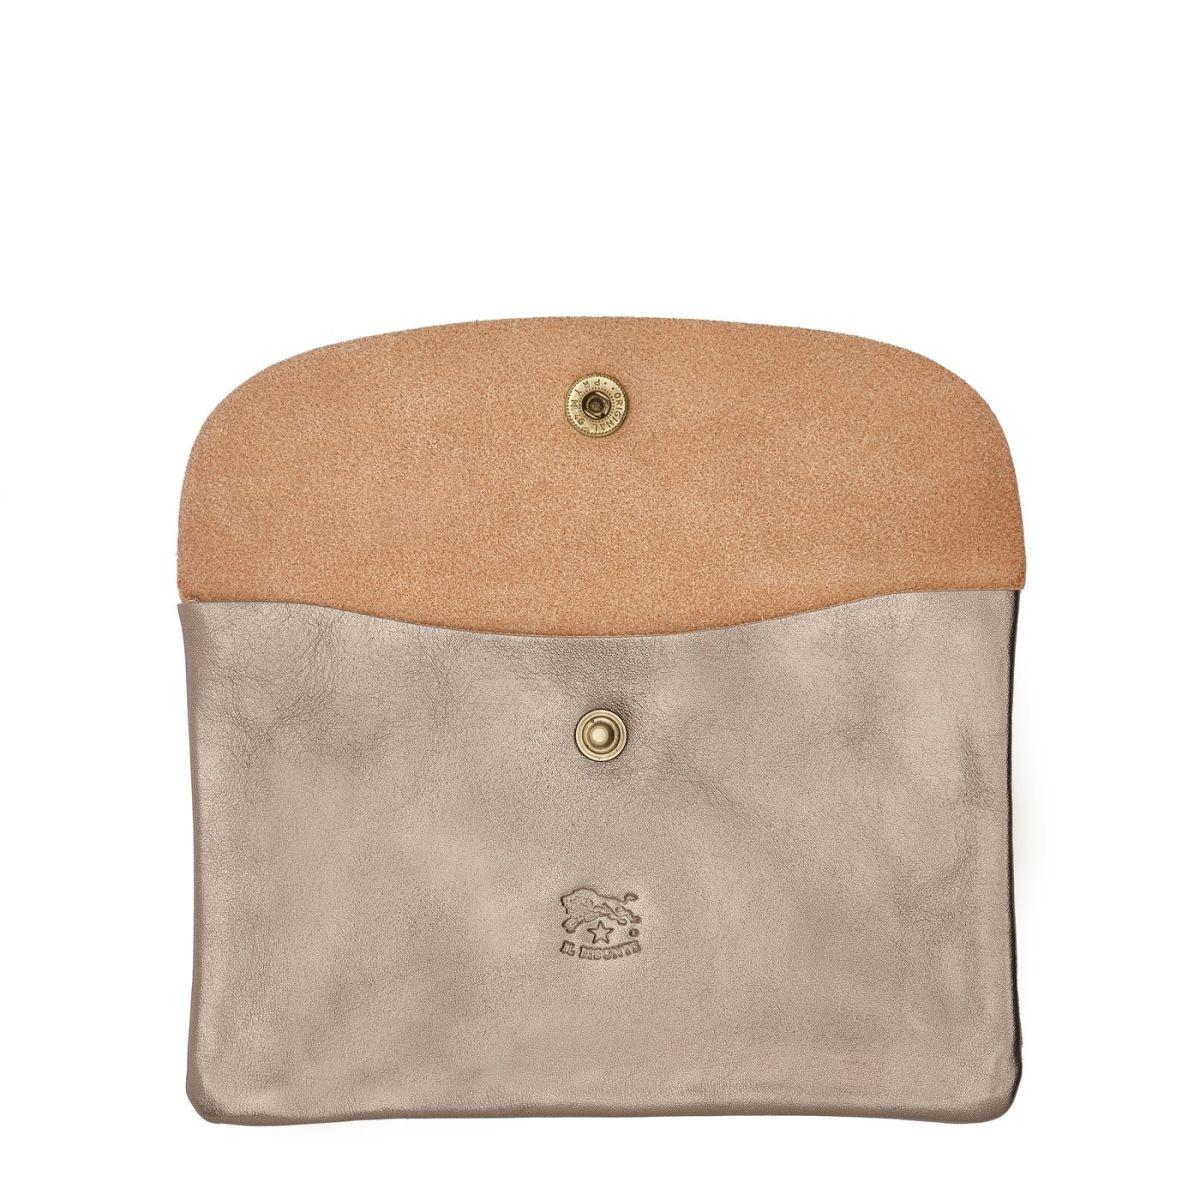 Case in Metallic Leather SCA007 color Metallic Bronze | Details